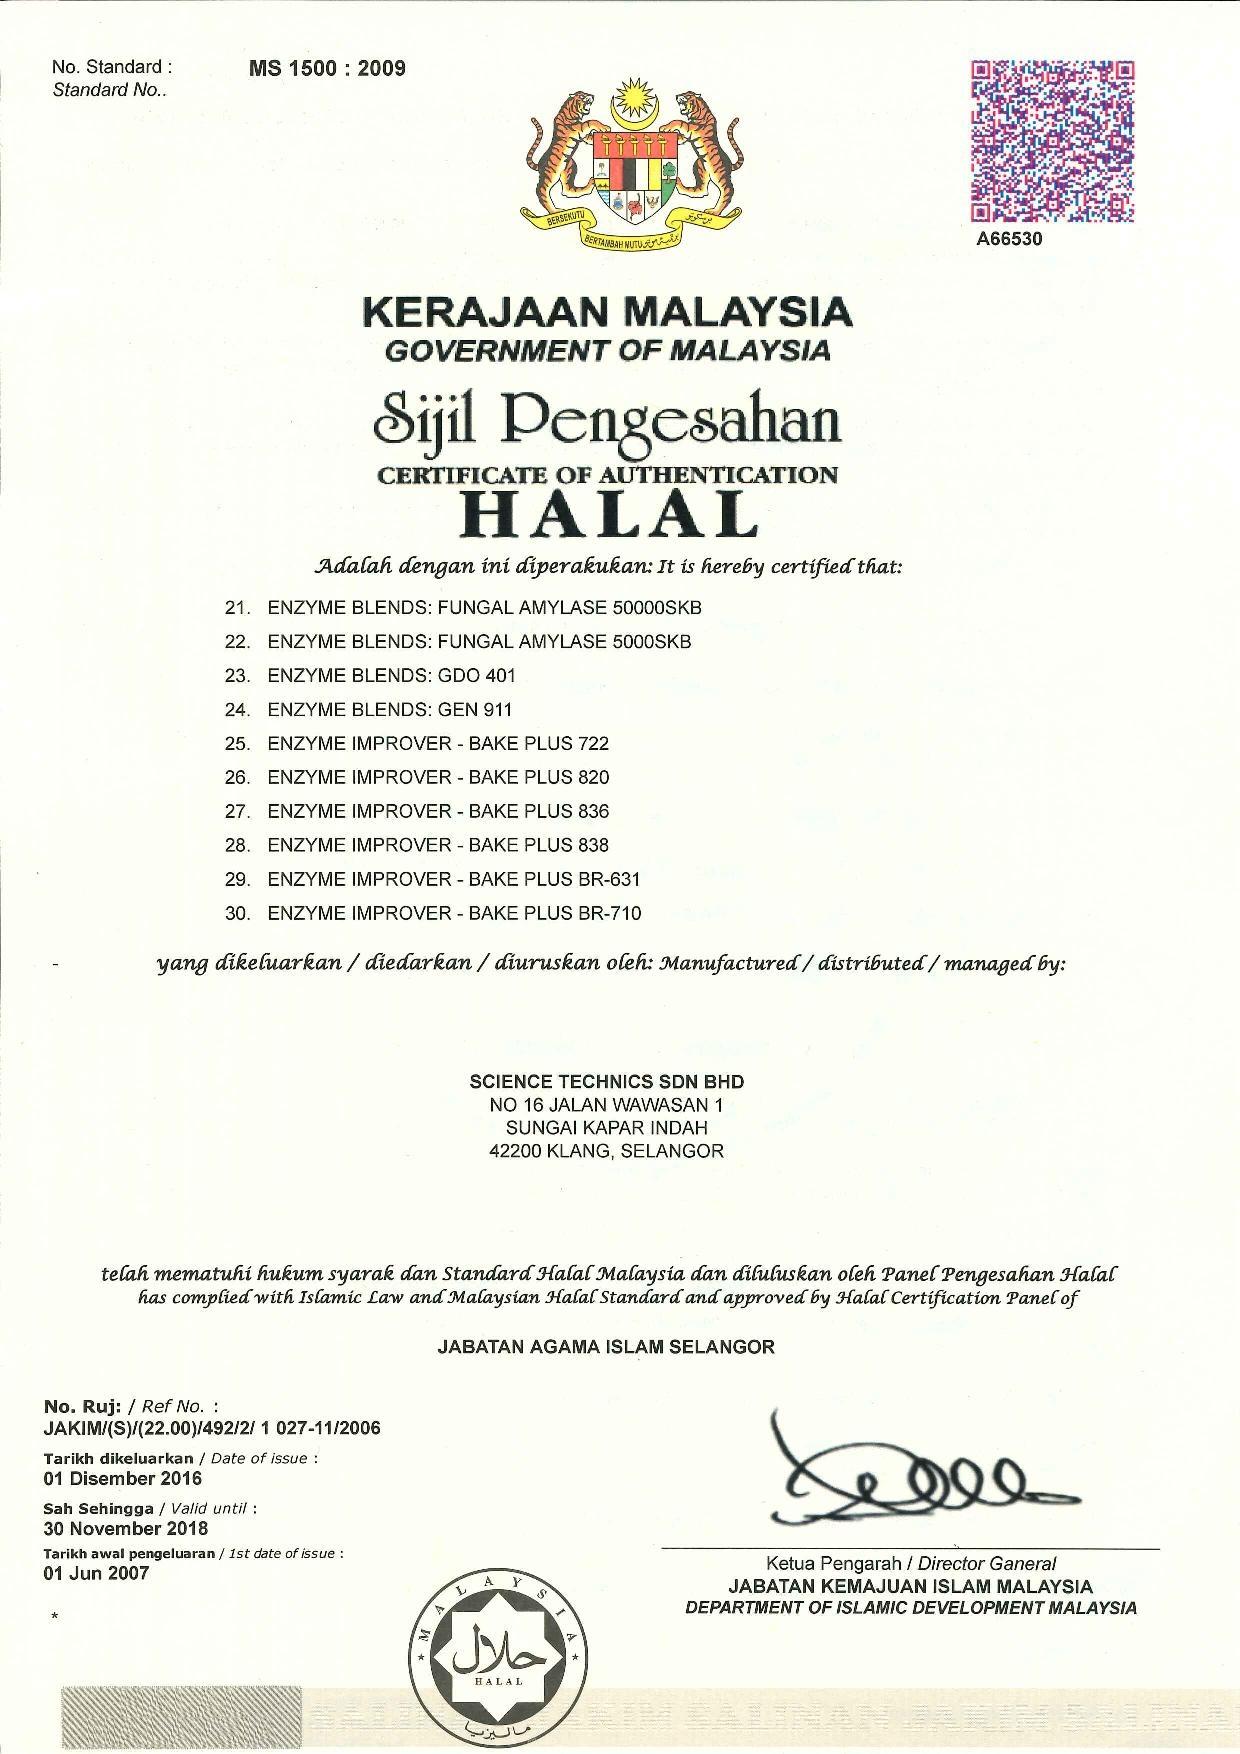 cert-halal